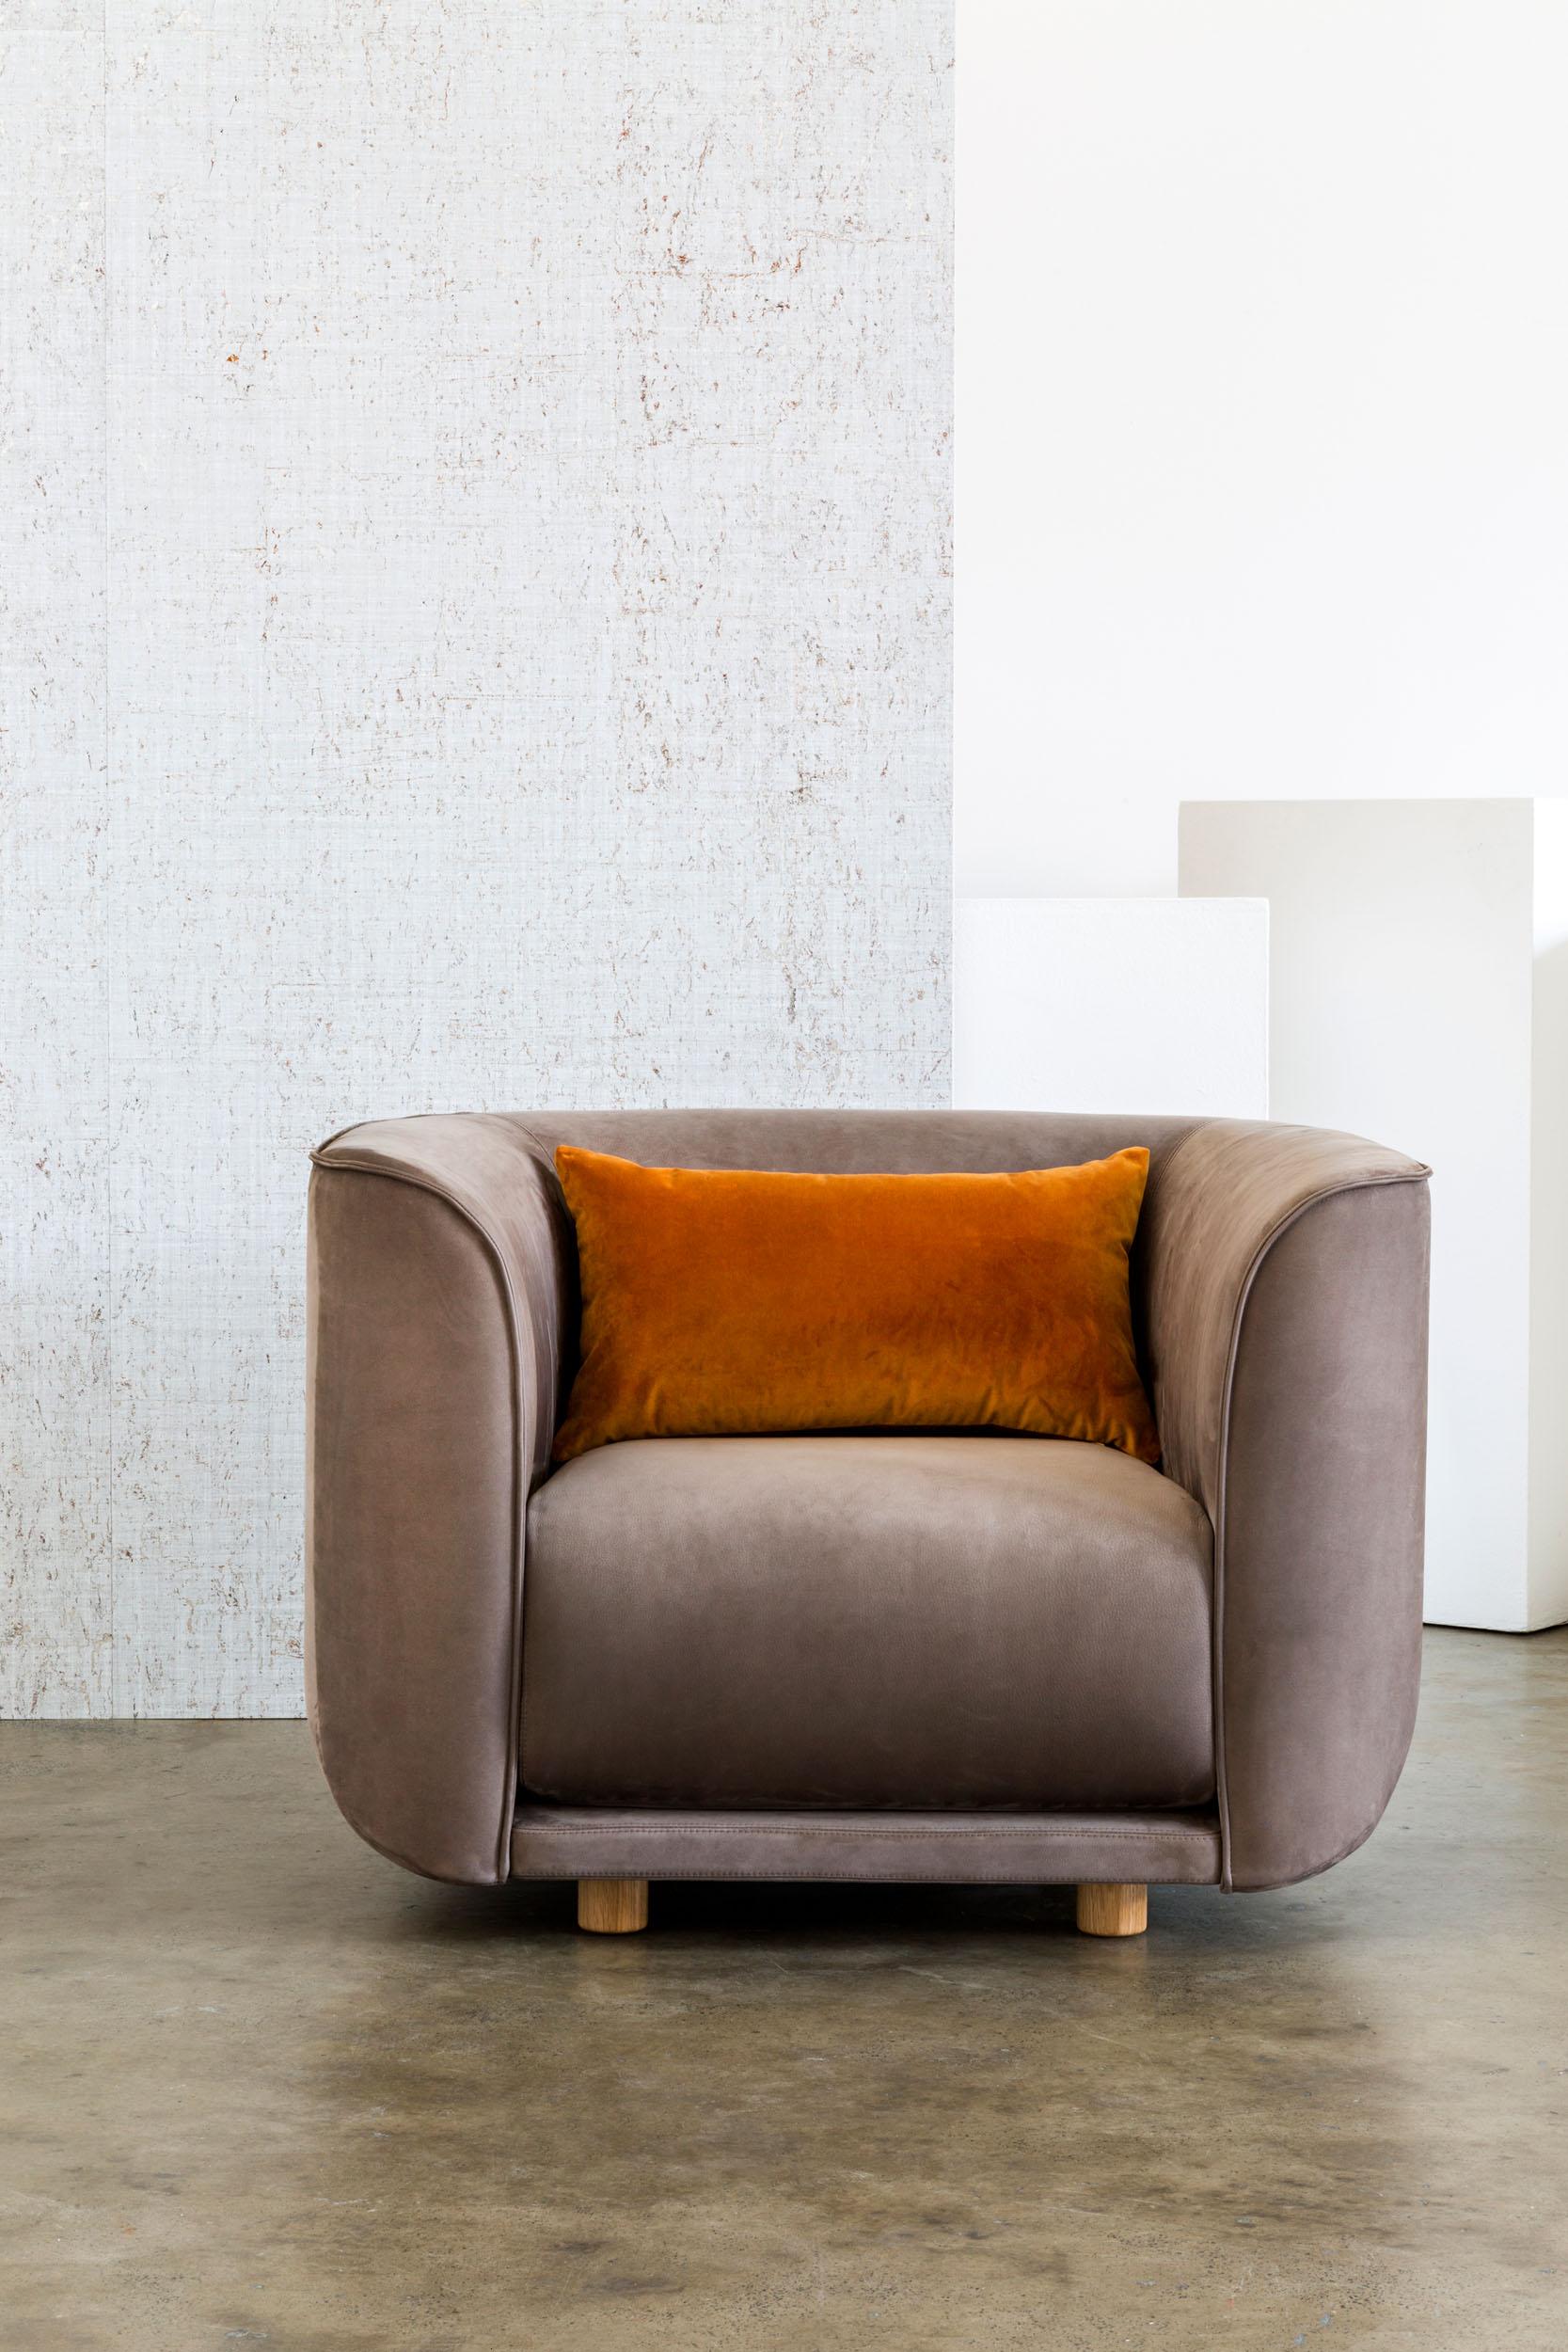 ICF Fat Tulip Chair in Atelier